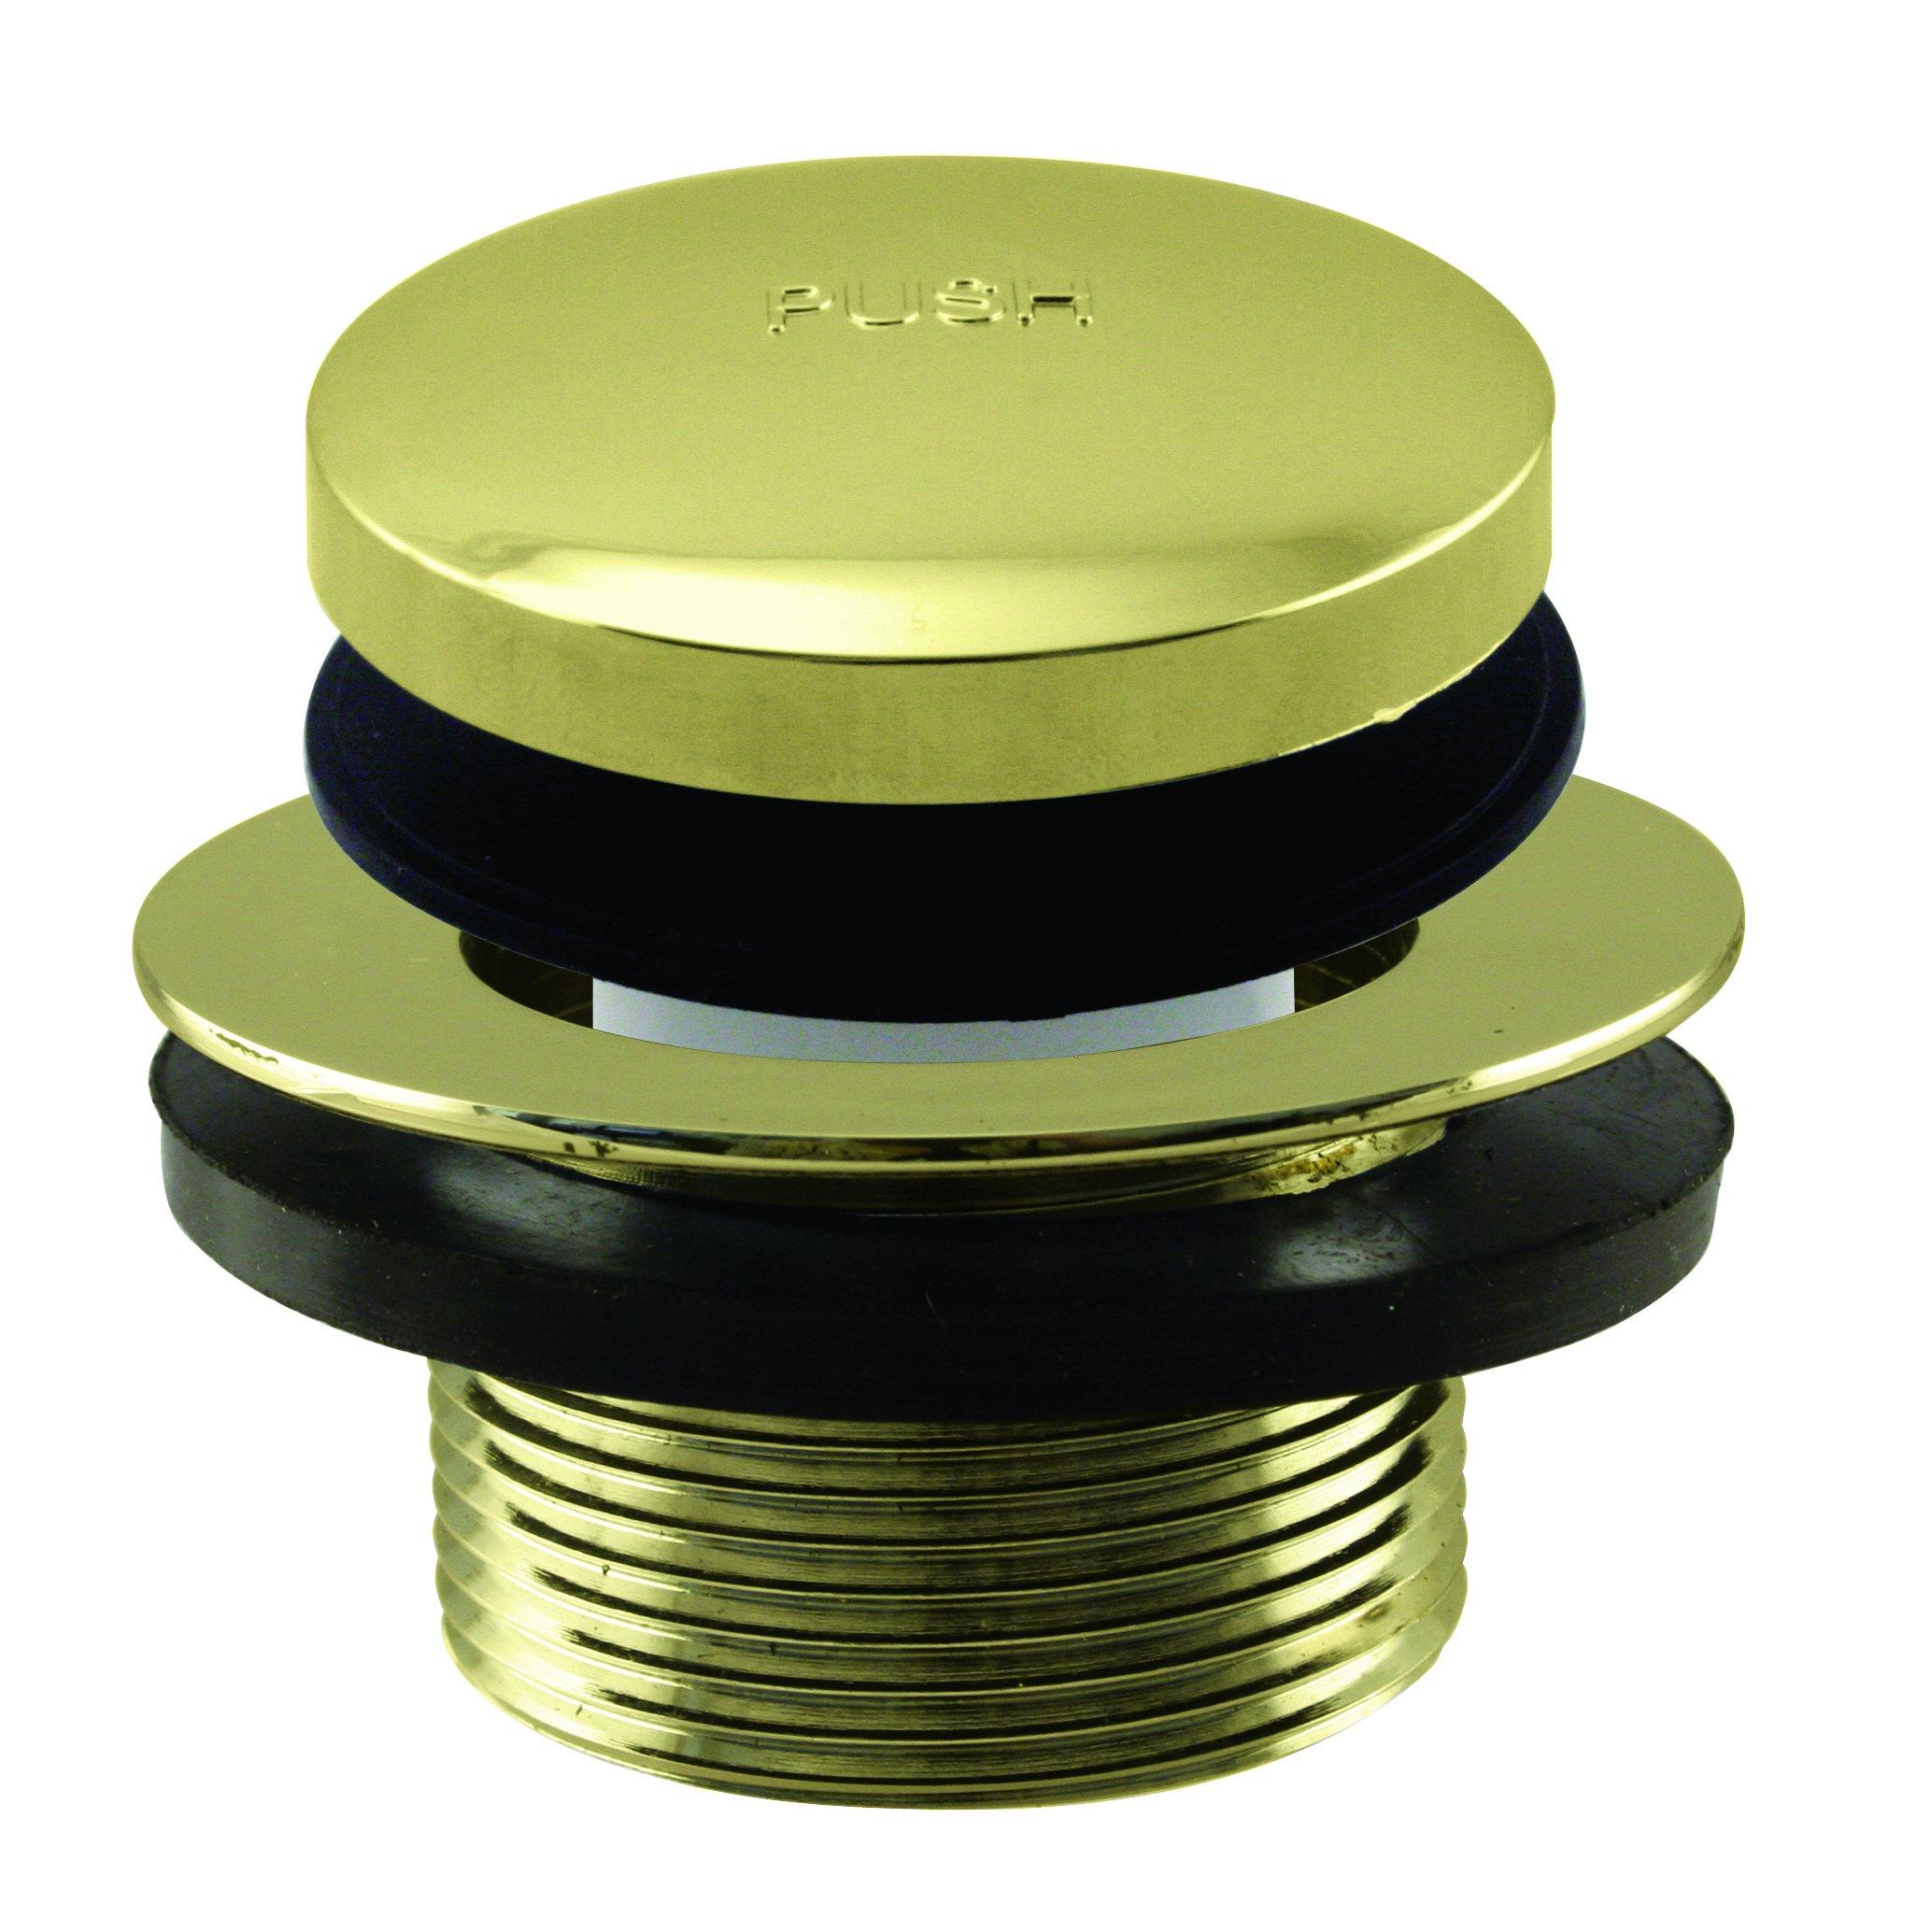 Westbrass Tip Toe 1-1/2'' NPSM Coarse Thread Bath Drain, Polished Brass, D3322-01